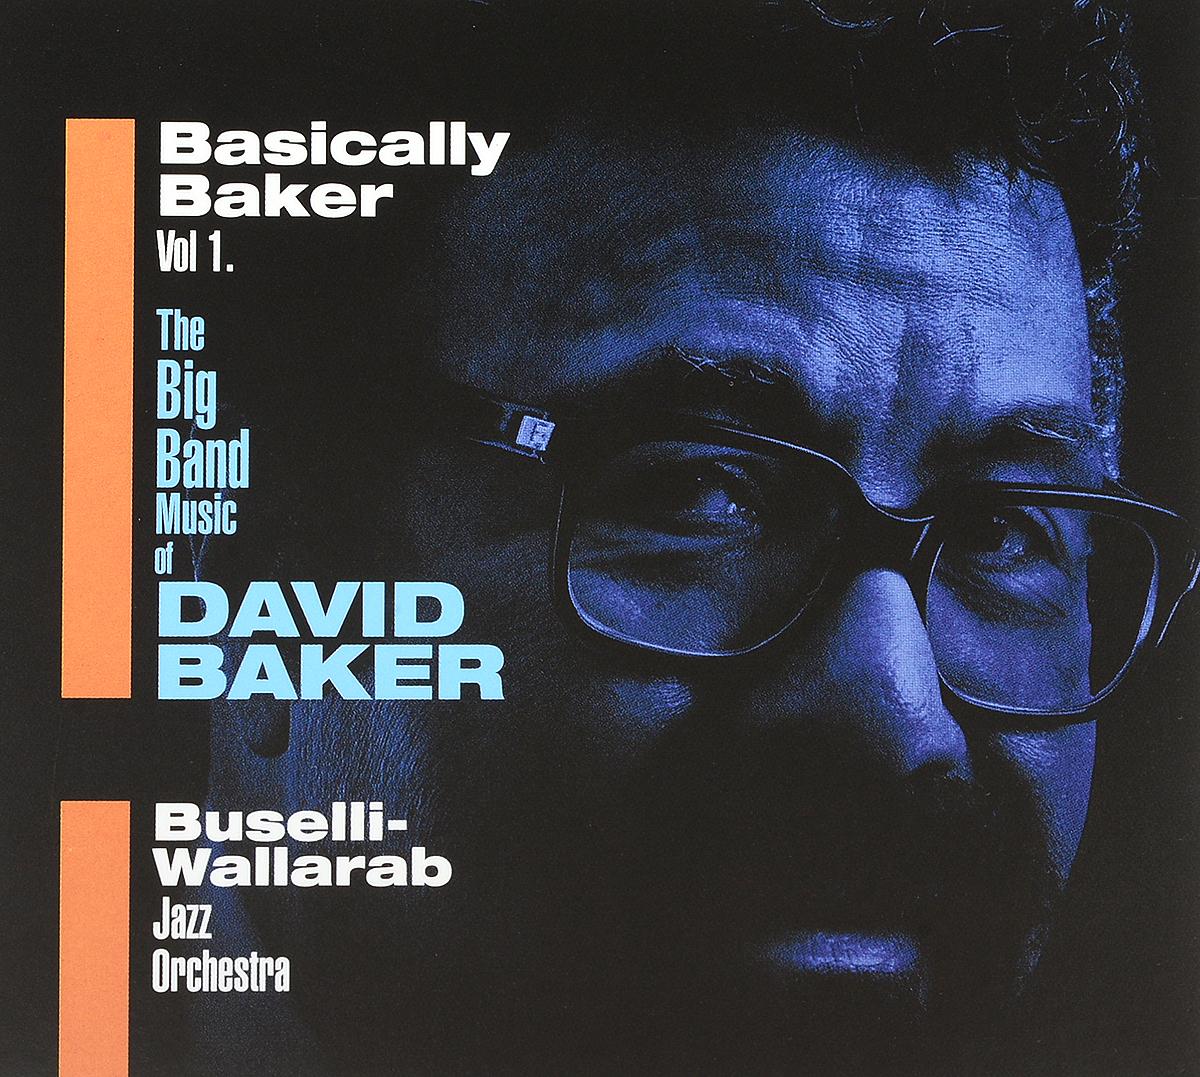 Дэвид Бейкер,Buselli-Wallarab Jazz Orchestra Buselli-Wallarab Jazz Orchestra. Basically Baker. Vol.1 цена 2017